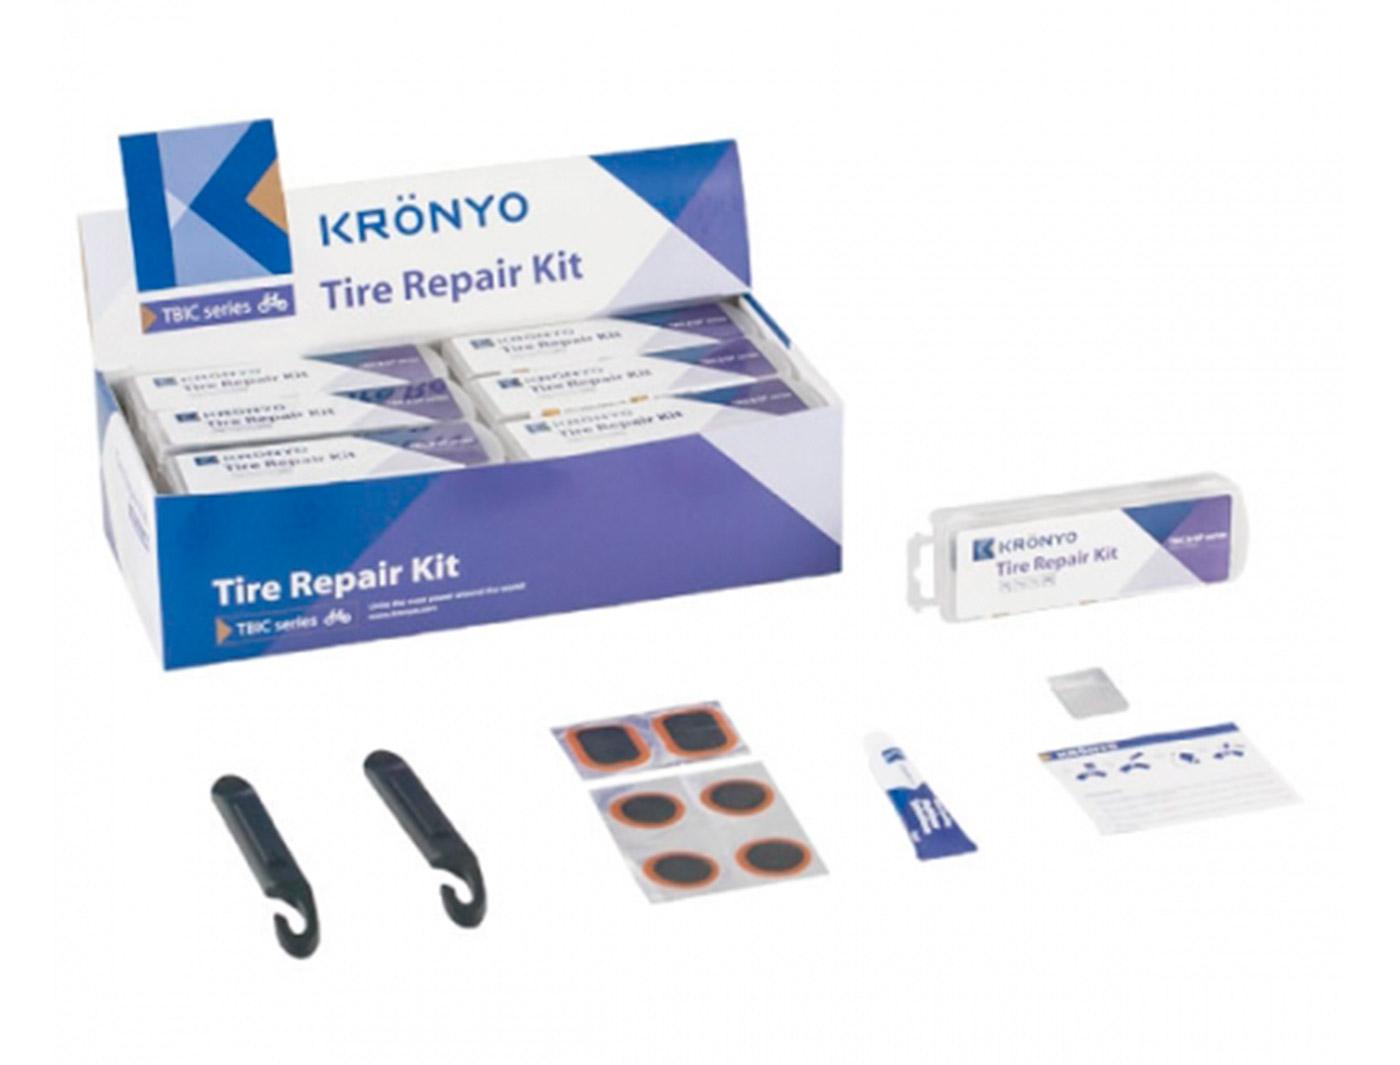 Аптечка 6-170311 TBIC-31C 6 суперзаплаток+клей+монтировки+терка (36) KRONYO